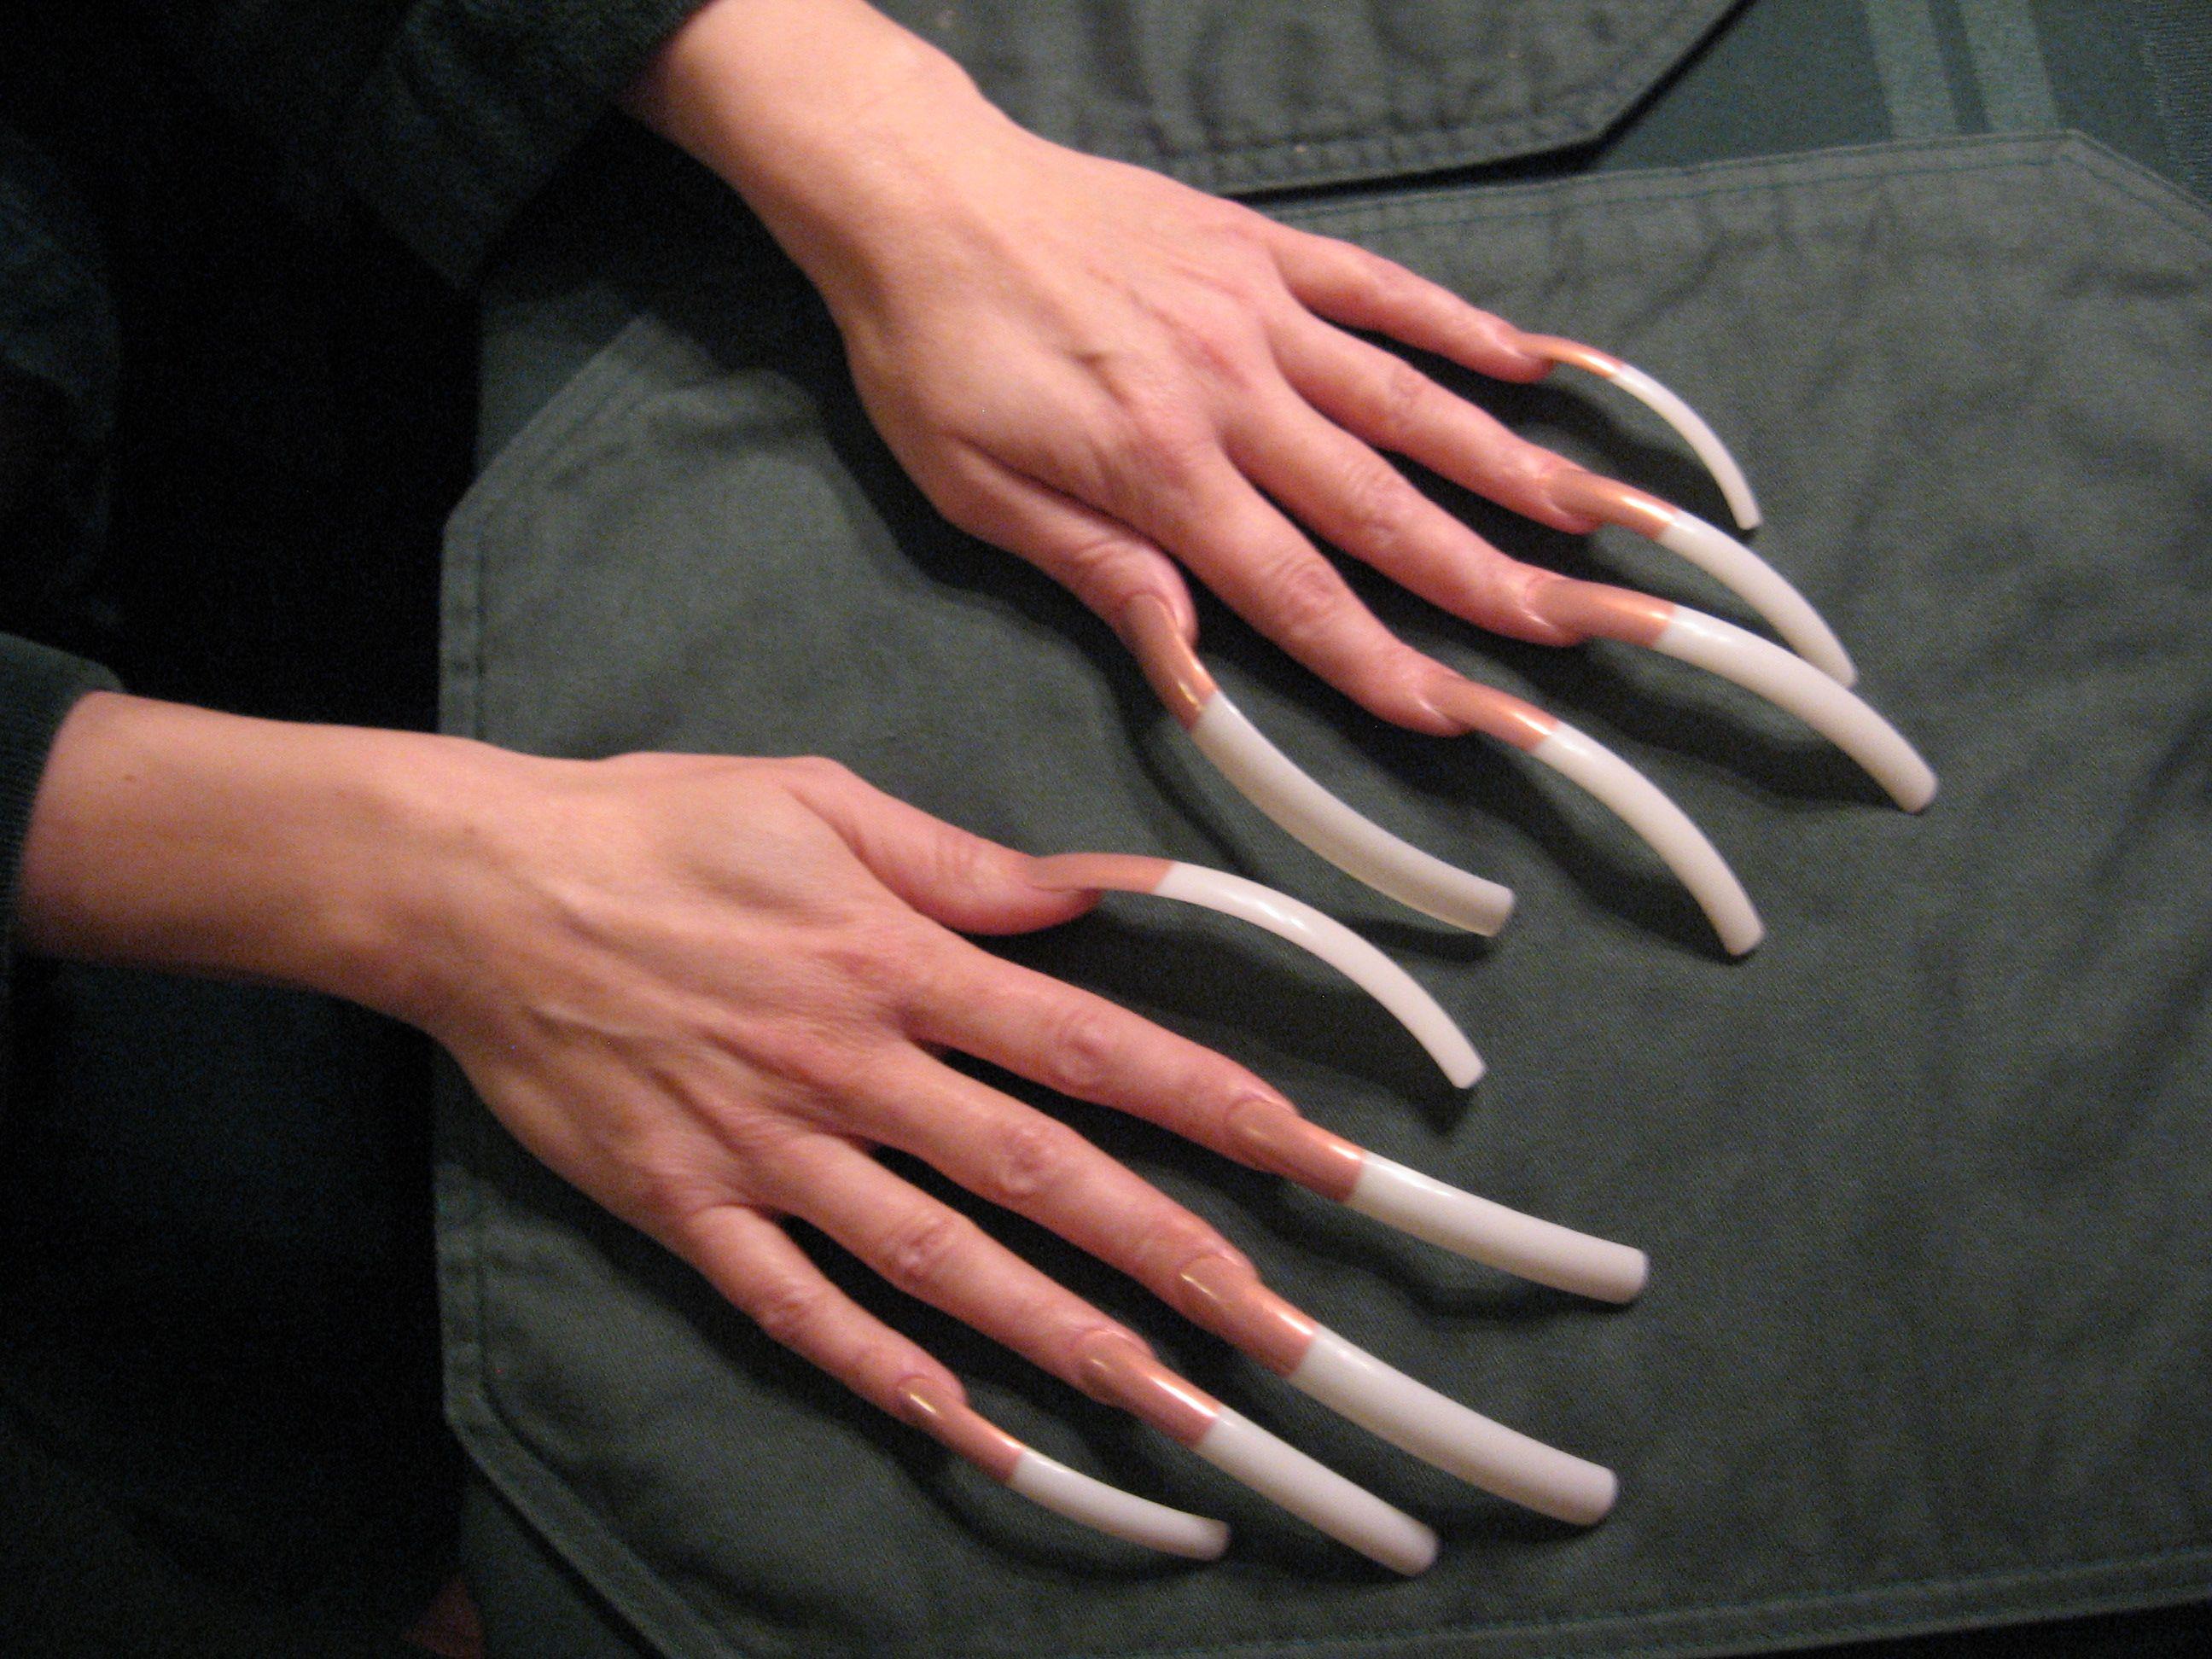 Super long French manicure | PJ's Nails | Pinterest ...